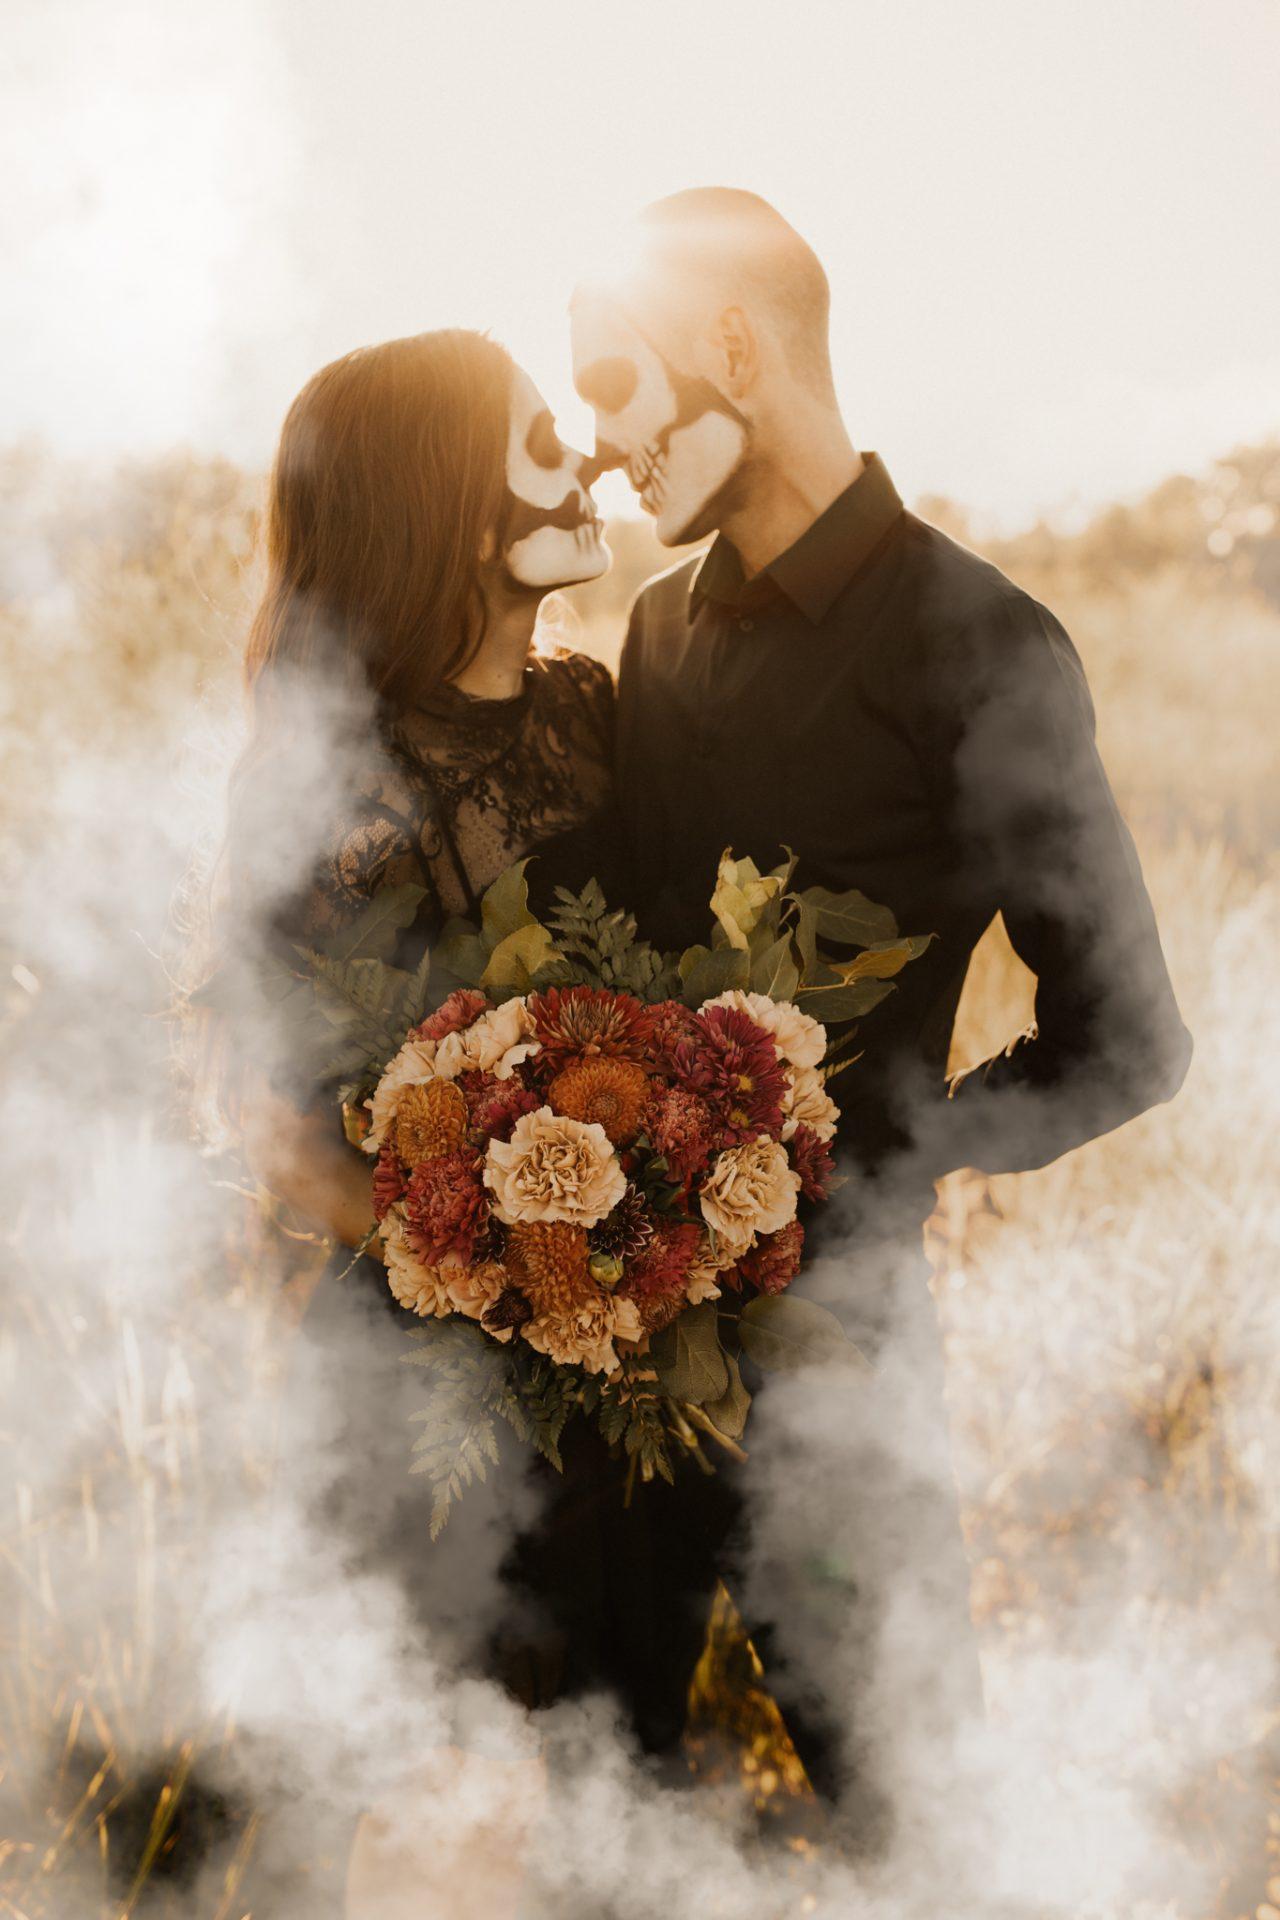 halloween couples shoot with smoke bombs